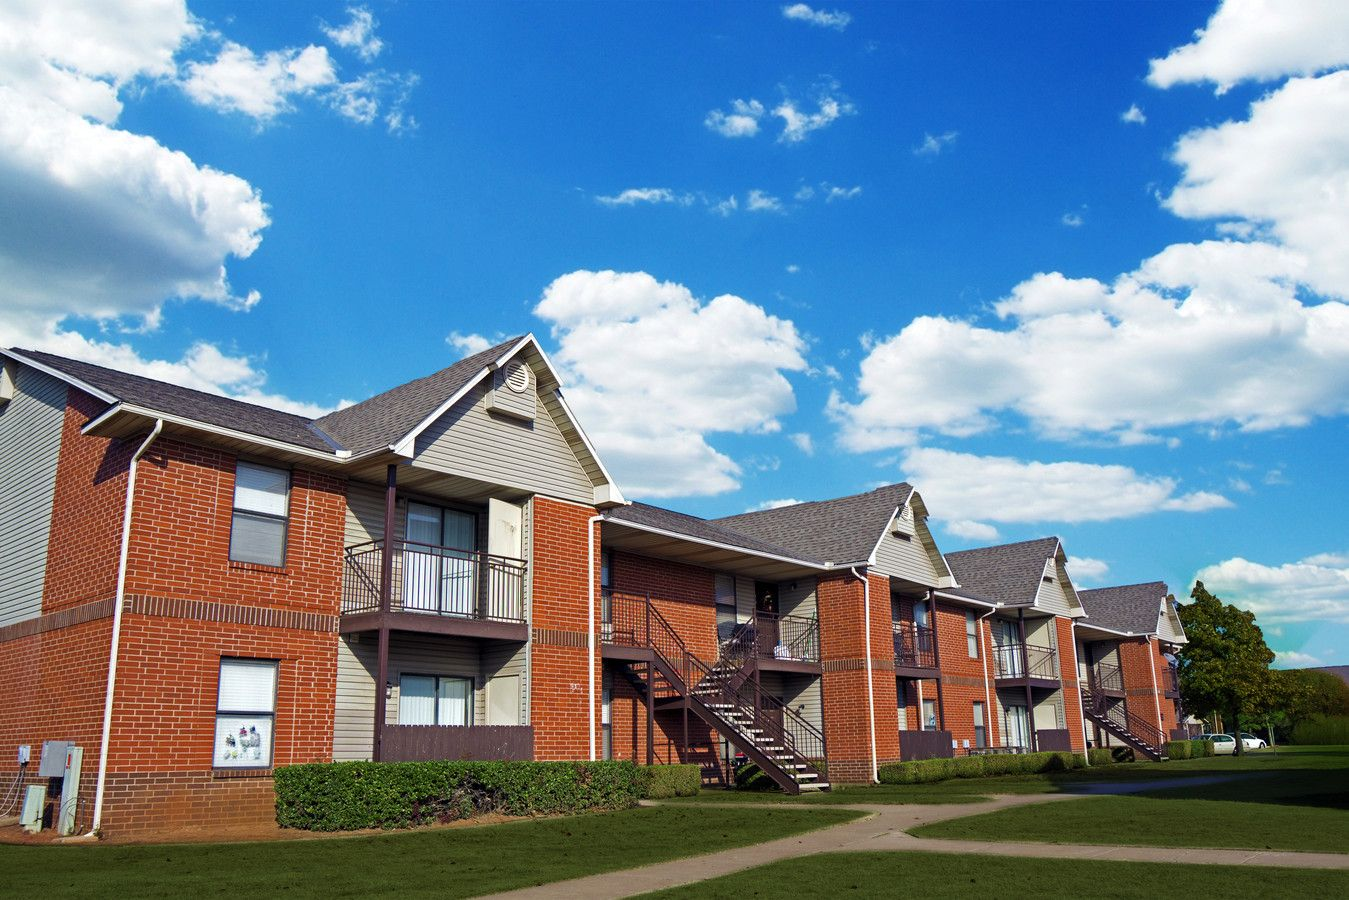 Coffee Creek Apartments Edmond Oklahoma In 2020 Image House Apartment Edmond Oklahoma